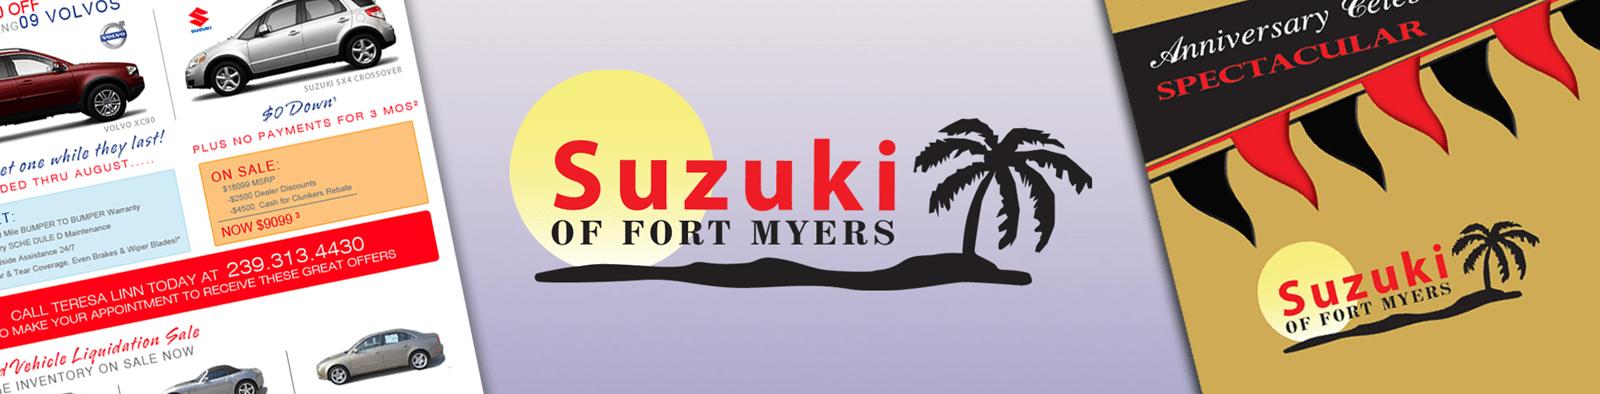 Retail Marketing Agency | Retail Marketing Creative: Suzuki